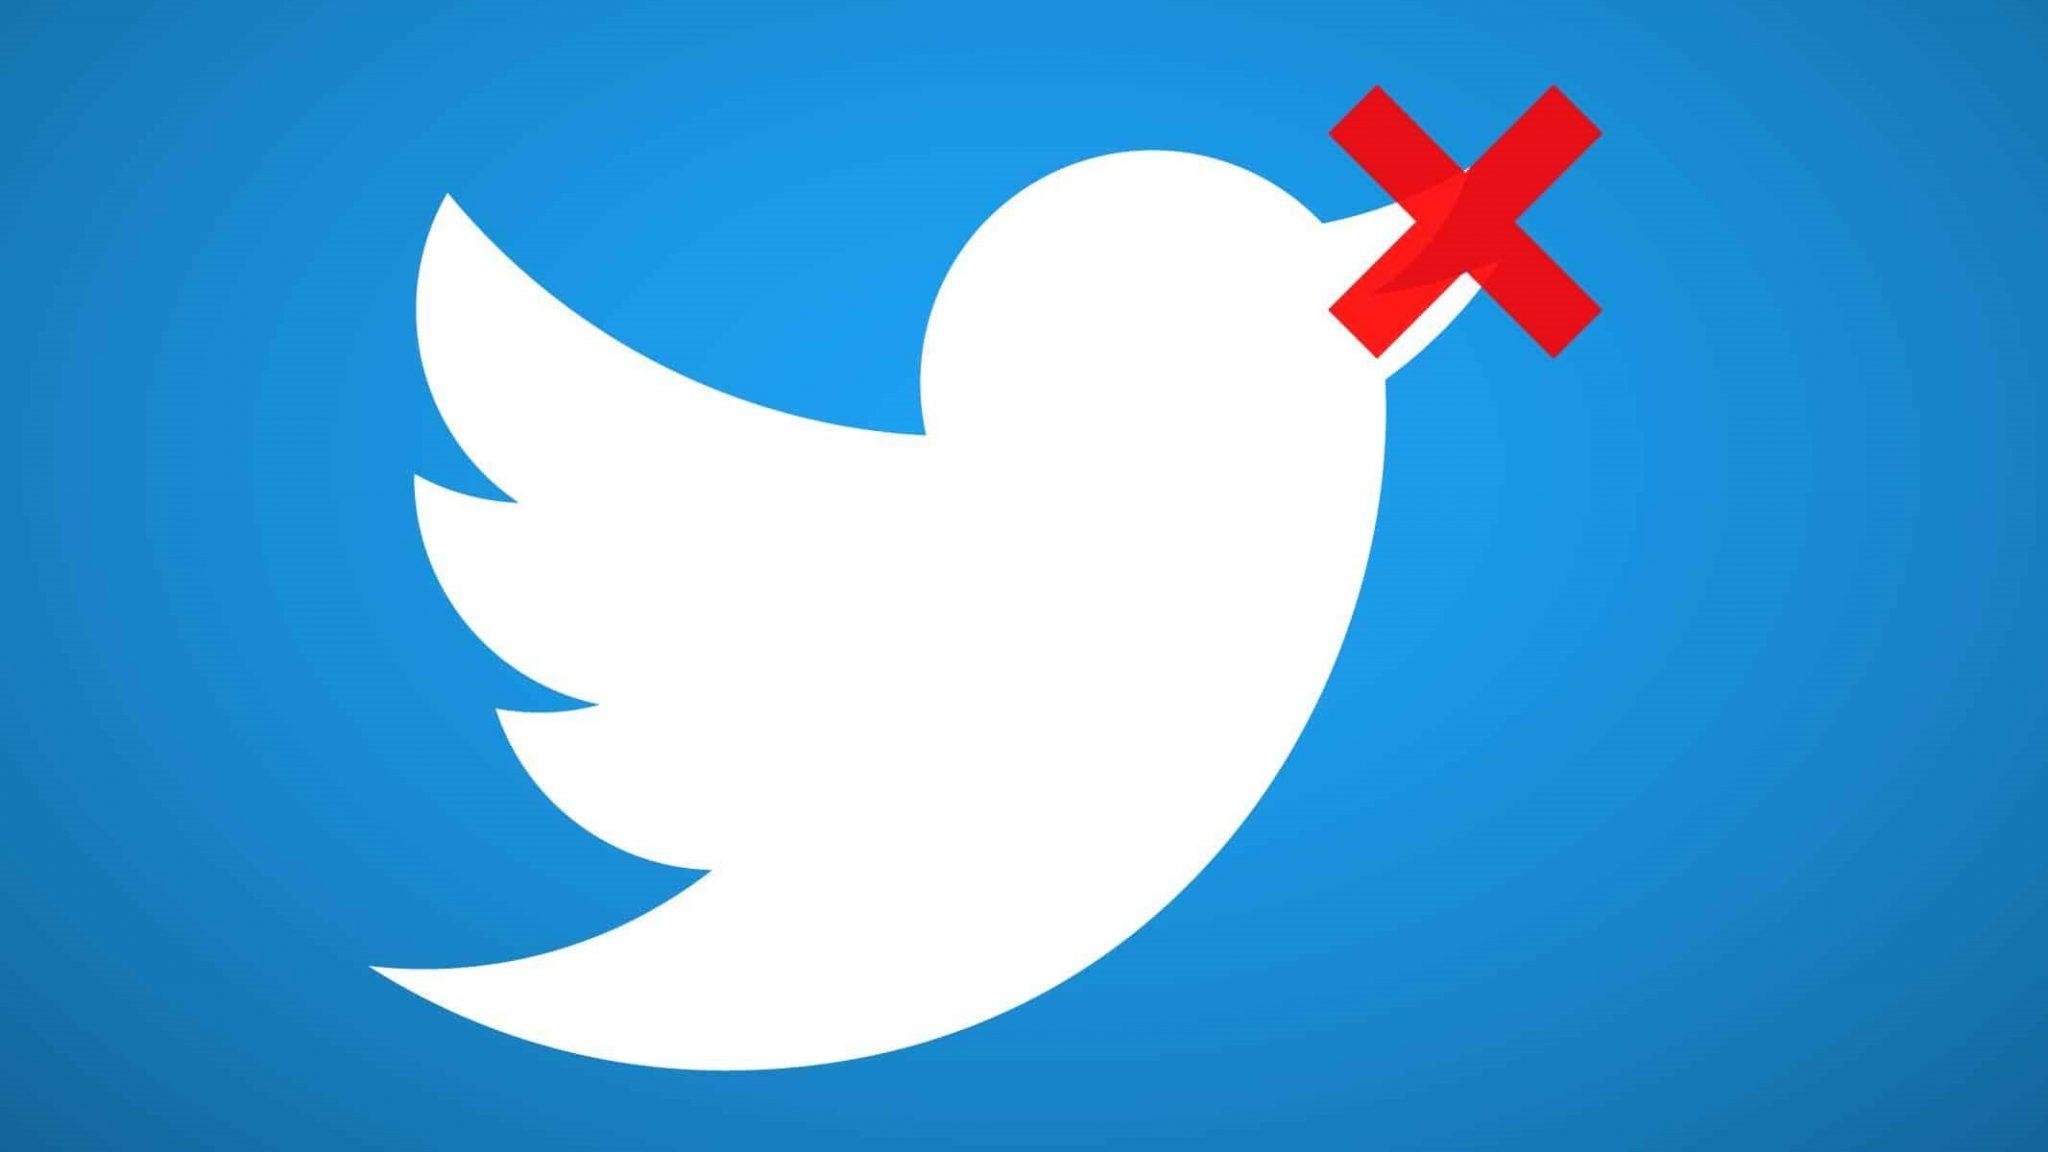 Destaque hack twitter scaled